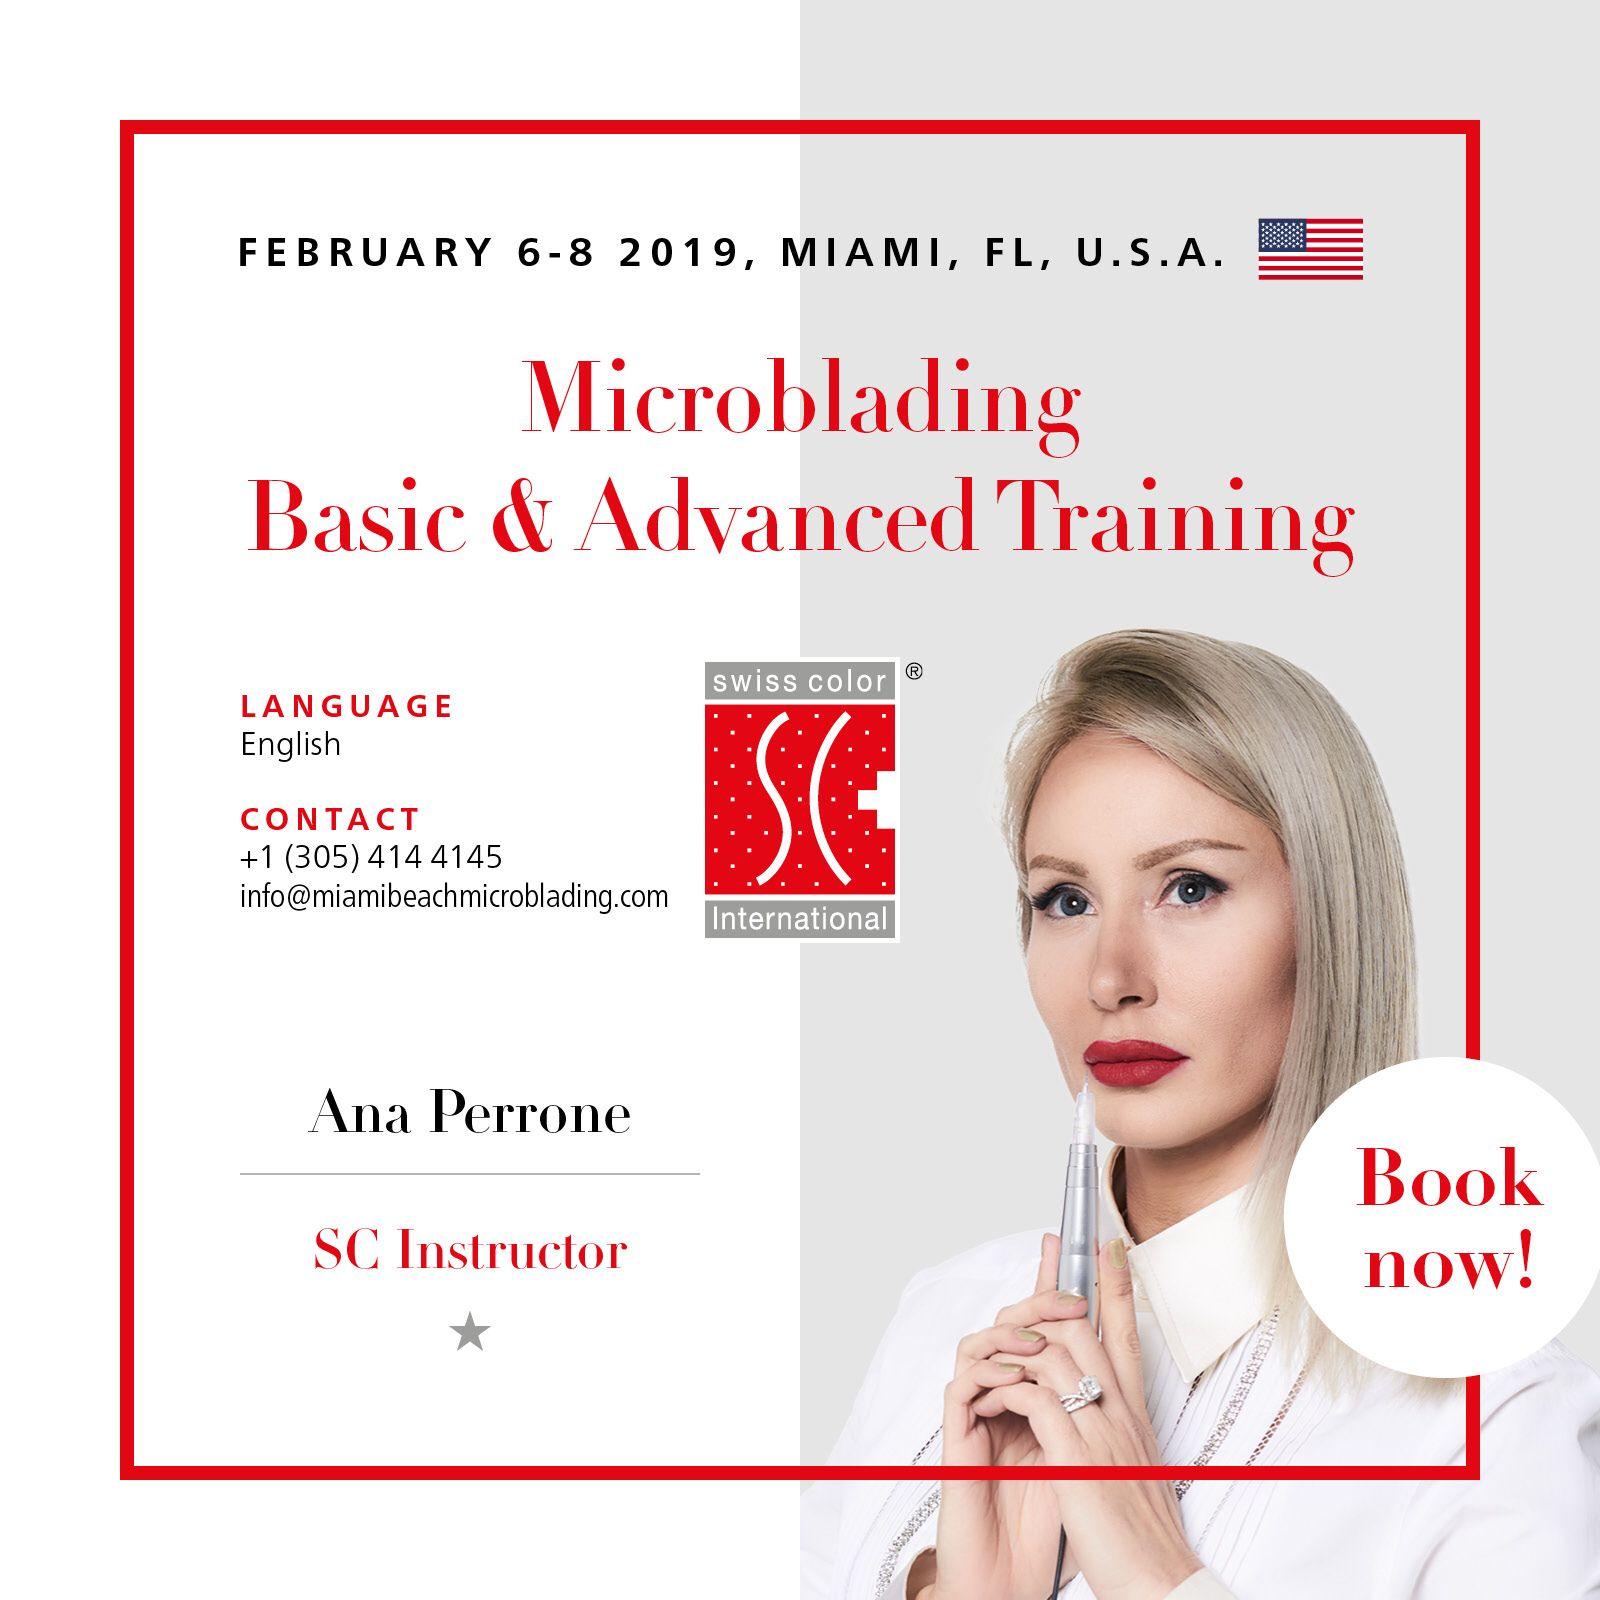 Microblading Class in Miami Microblading, Advanced